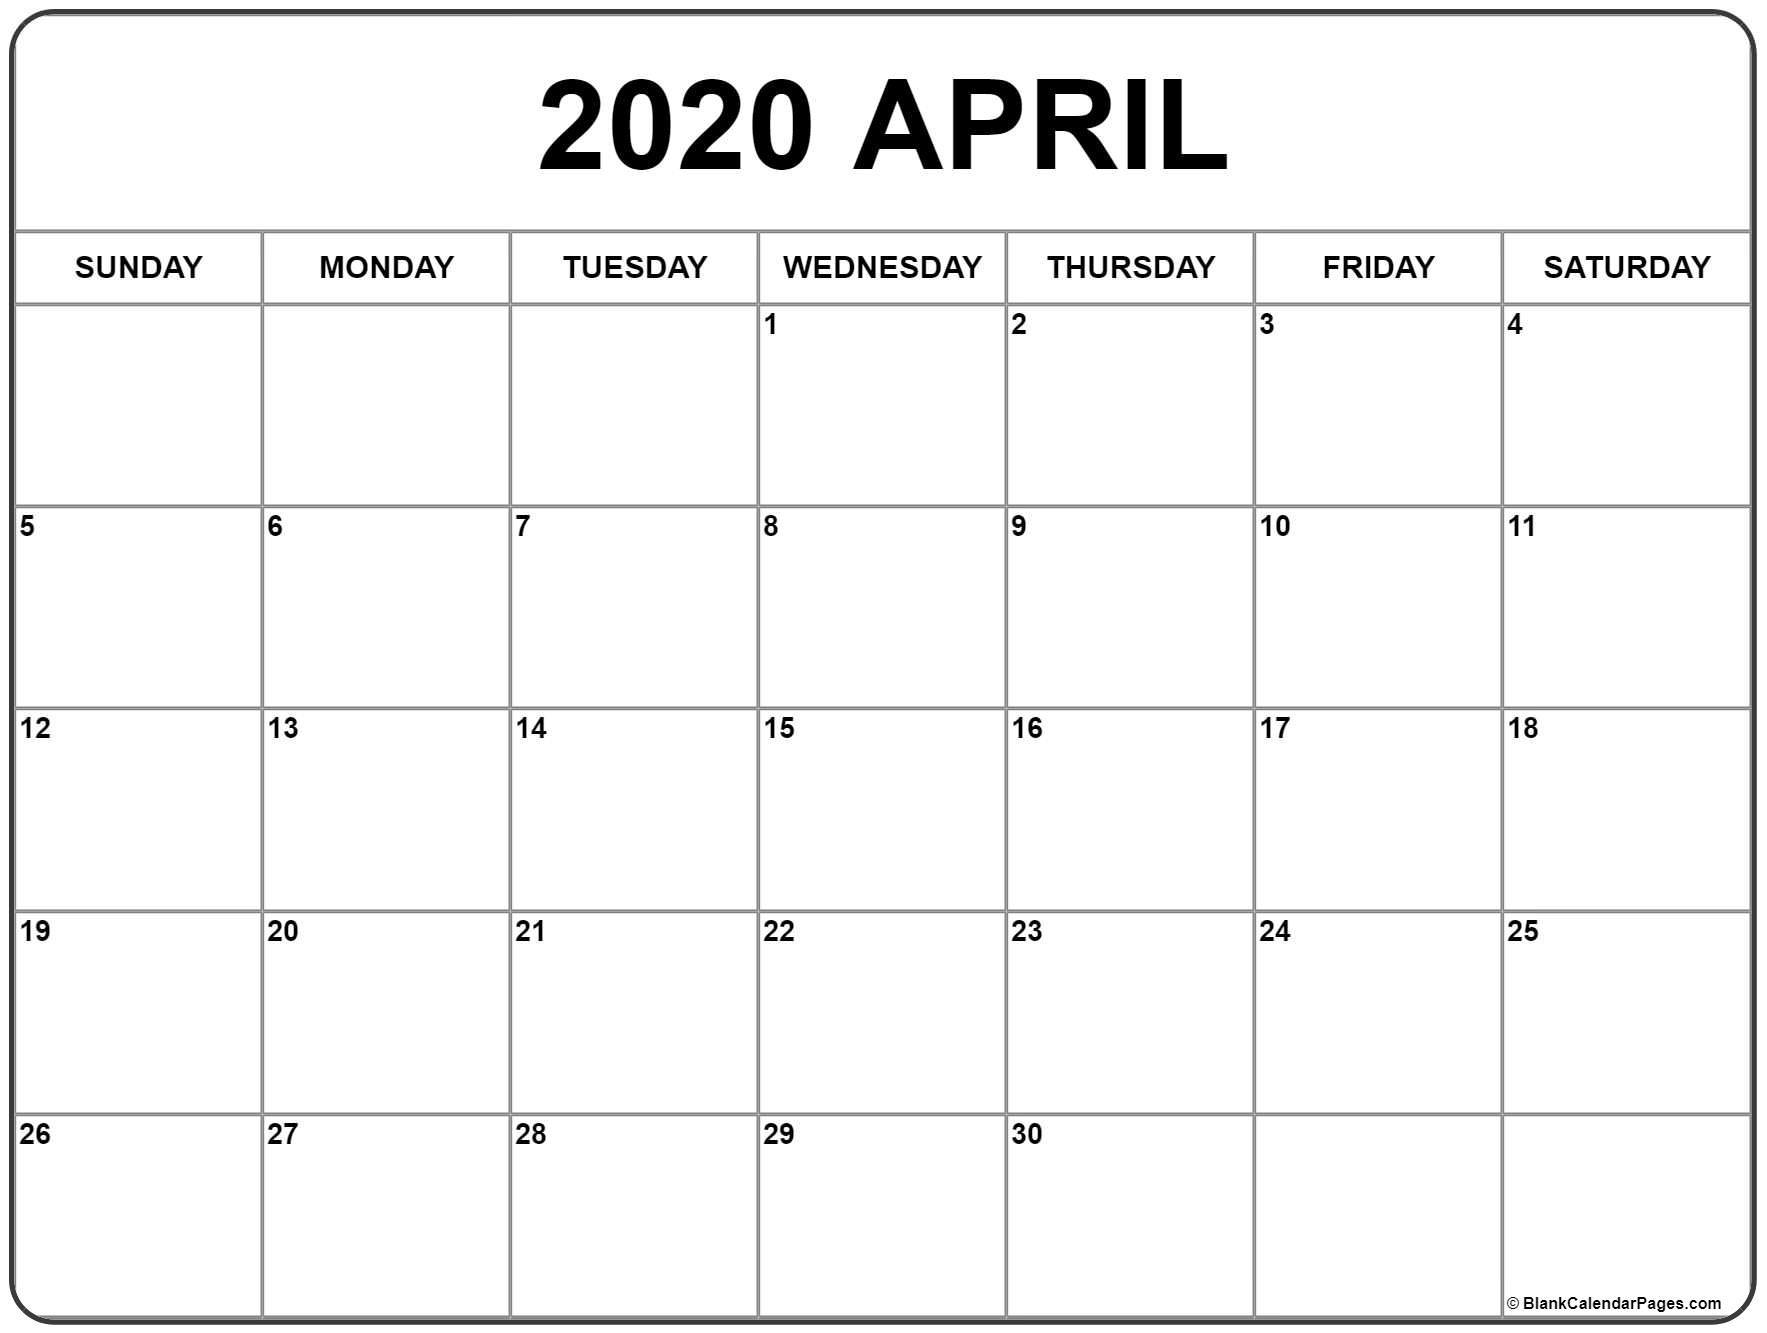 April 2020 Calendar | Free Printable Monthly Calendars  2020 Calendar Printable